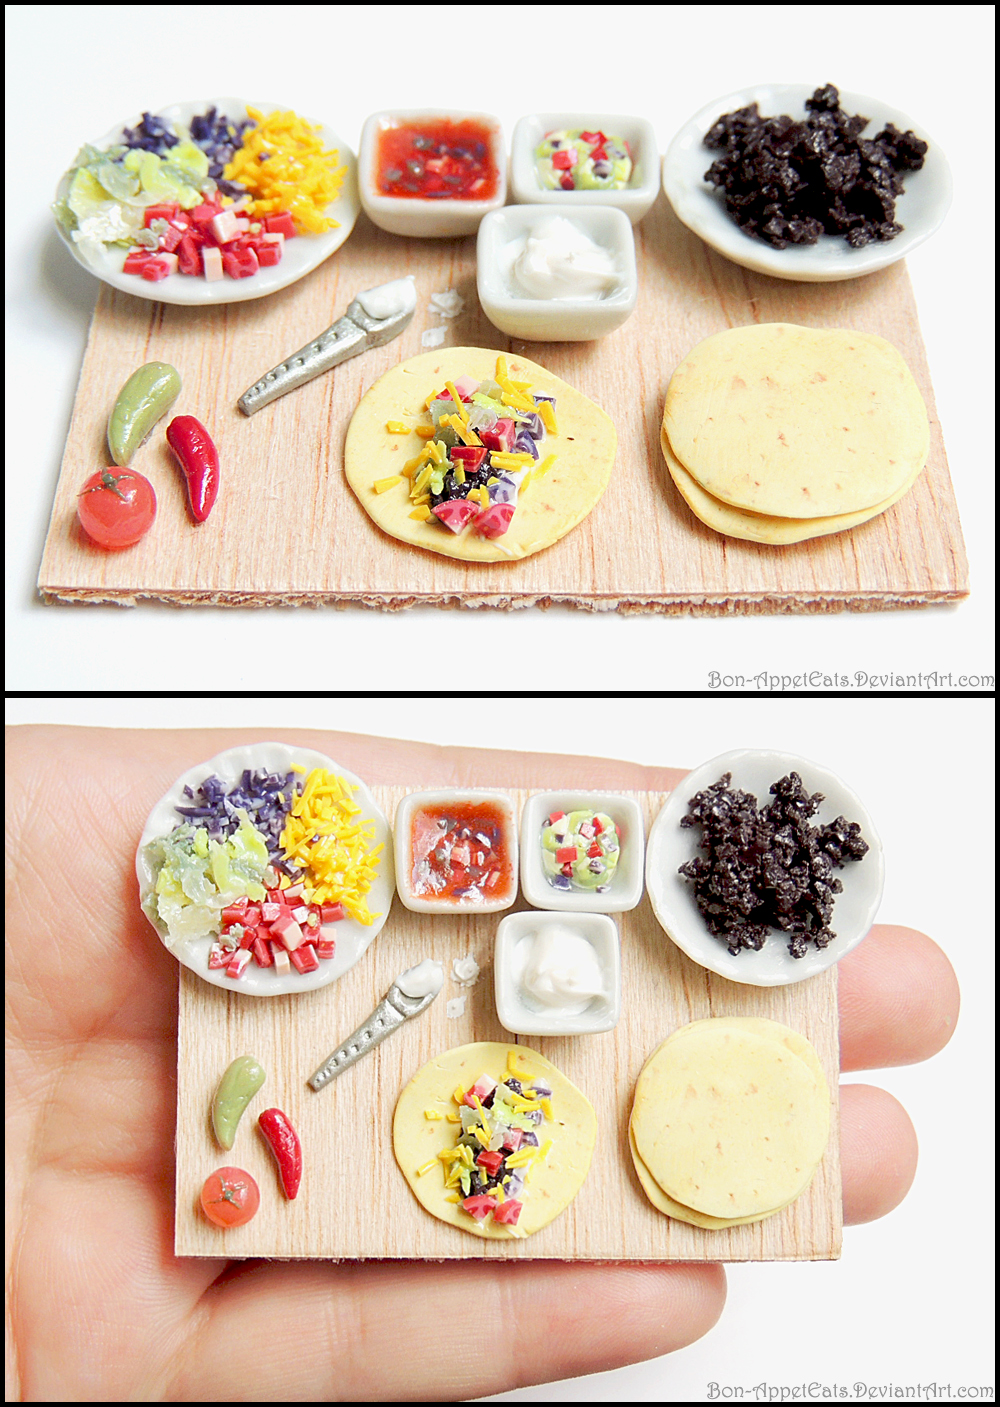 Soft Taco Prep Board by Bon-AppetEats